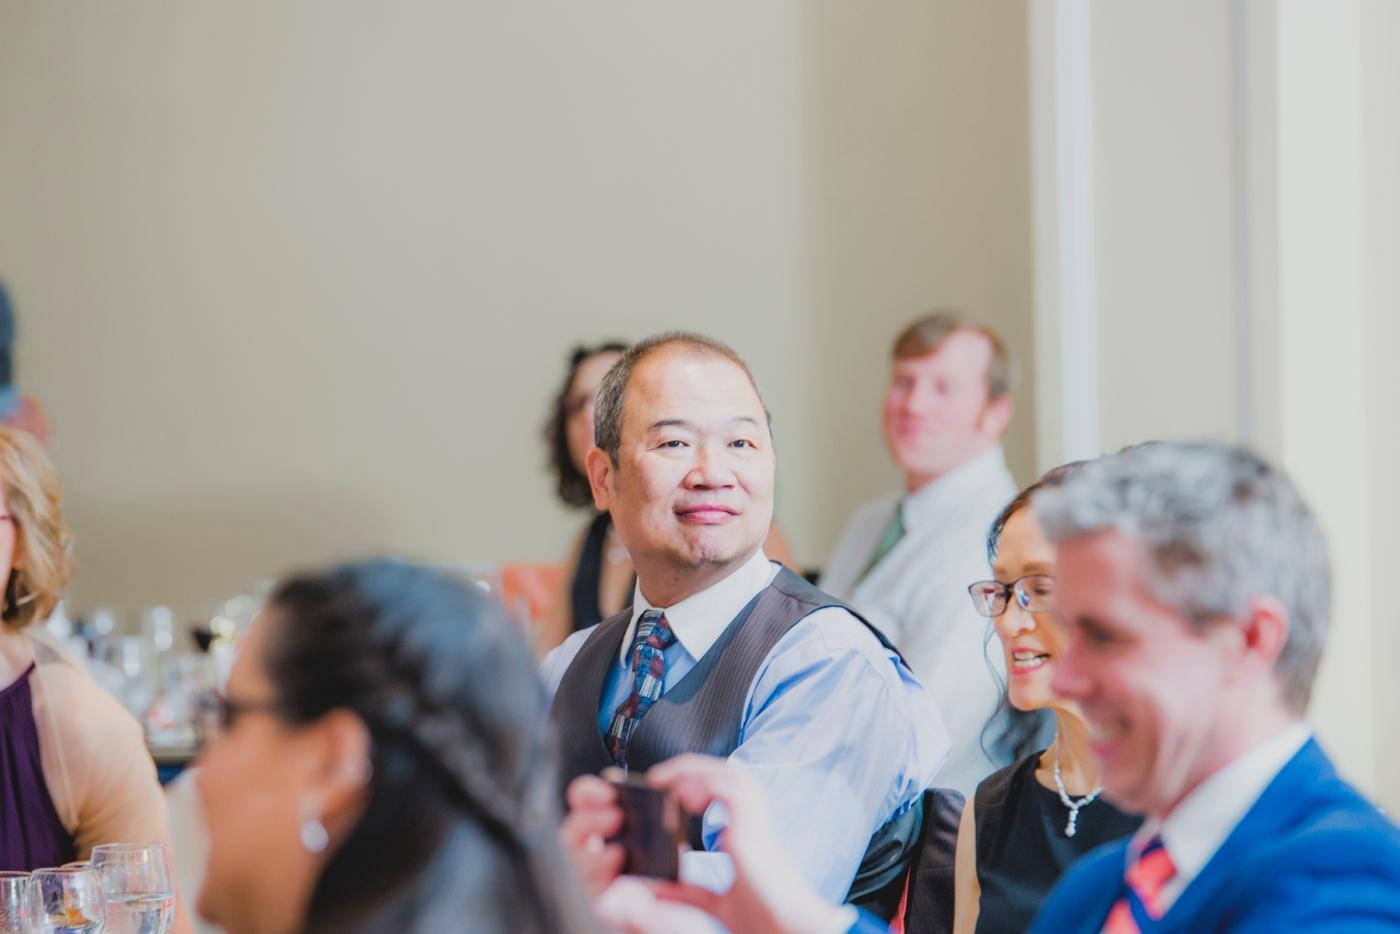 DSC_3233Everett_Wedding_Ballroom_Jane_Speleers_photography_Rachel_and_Edmund_reception_2017